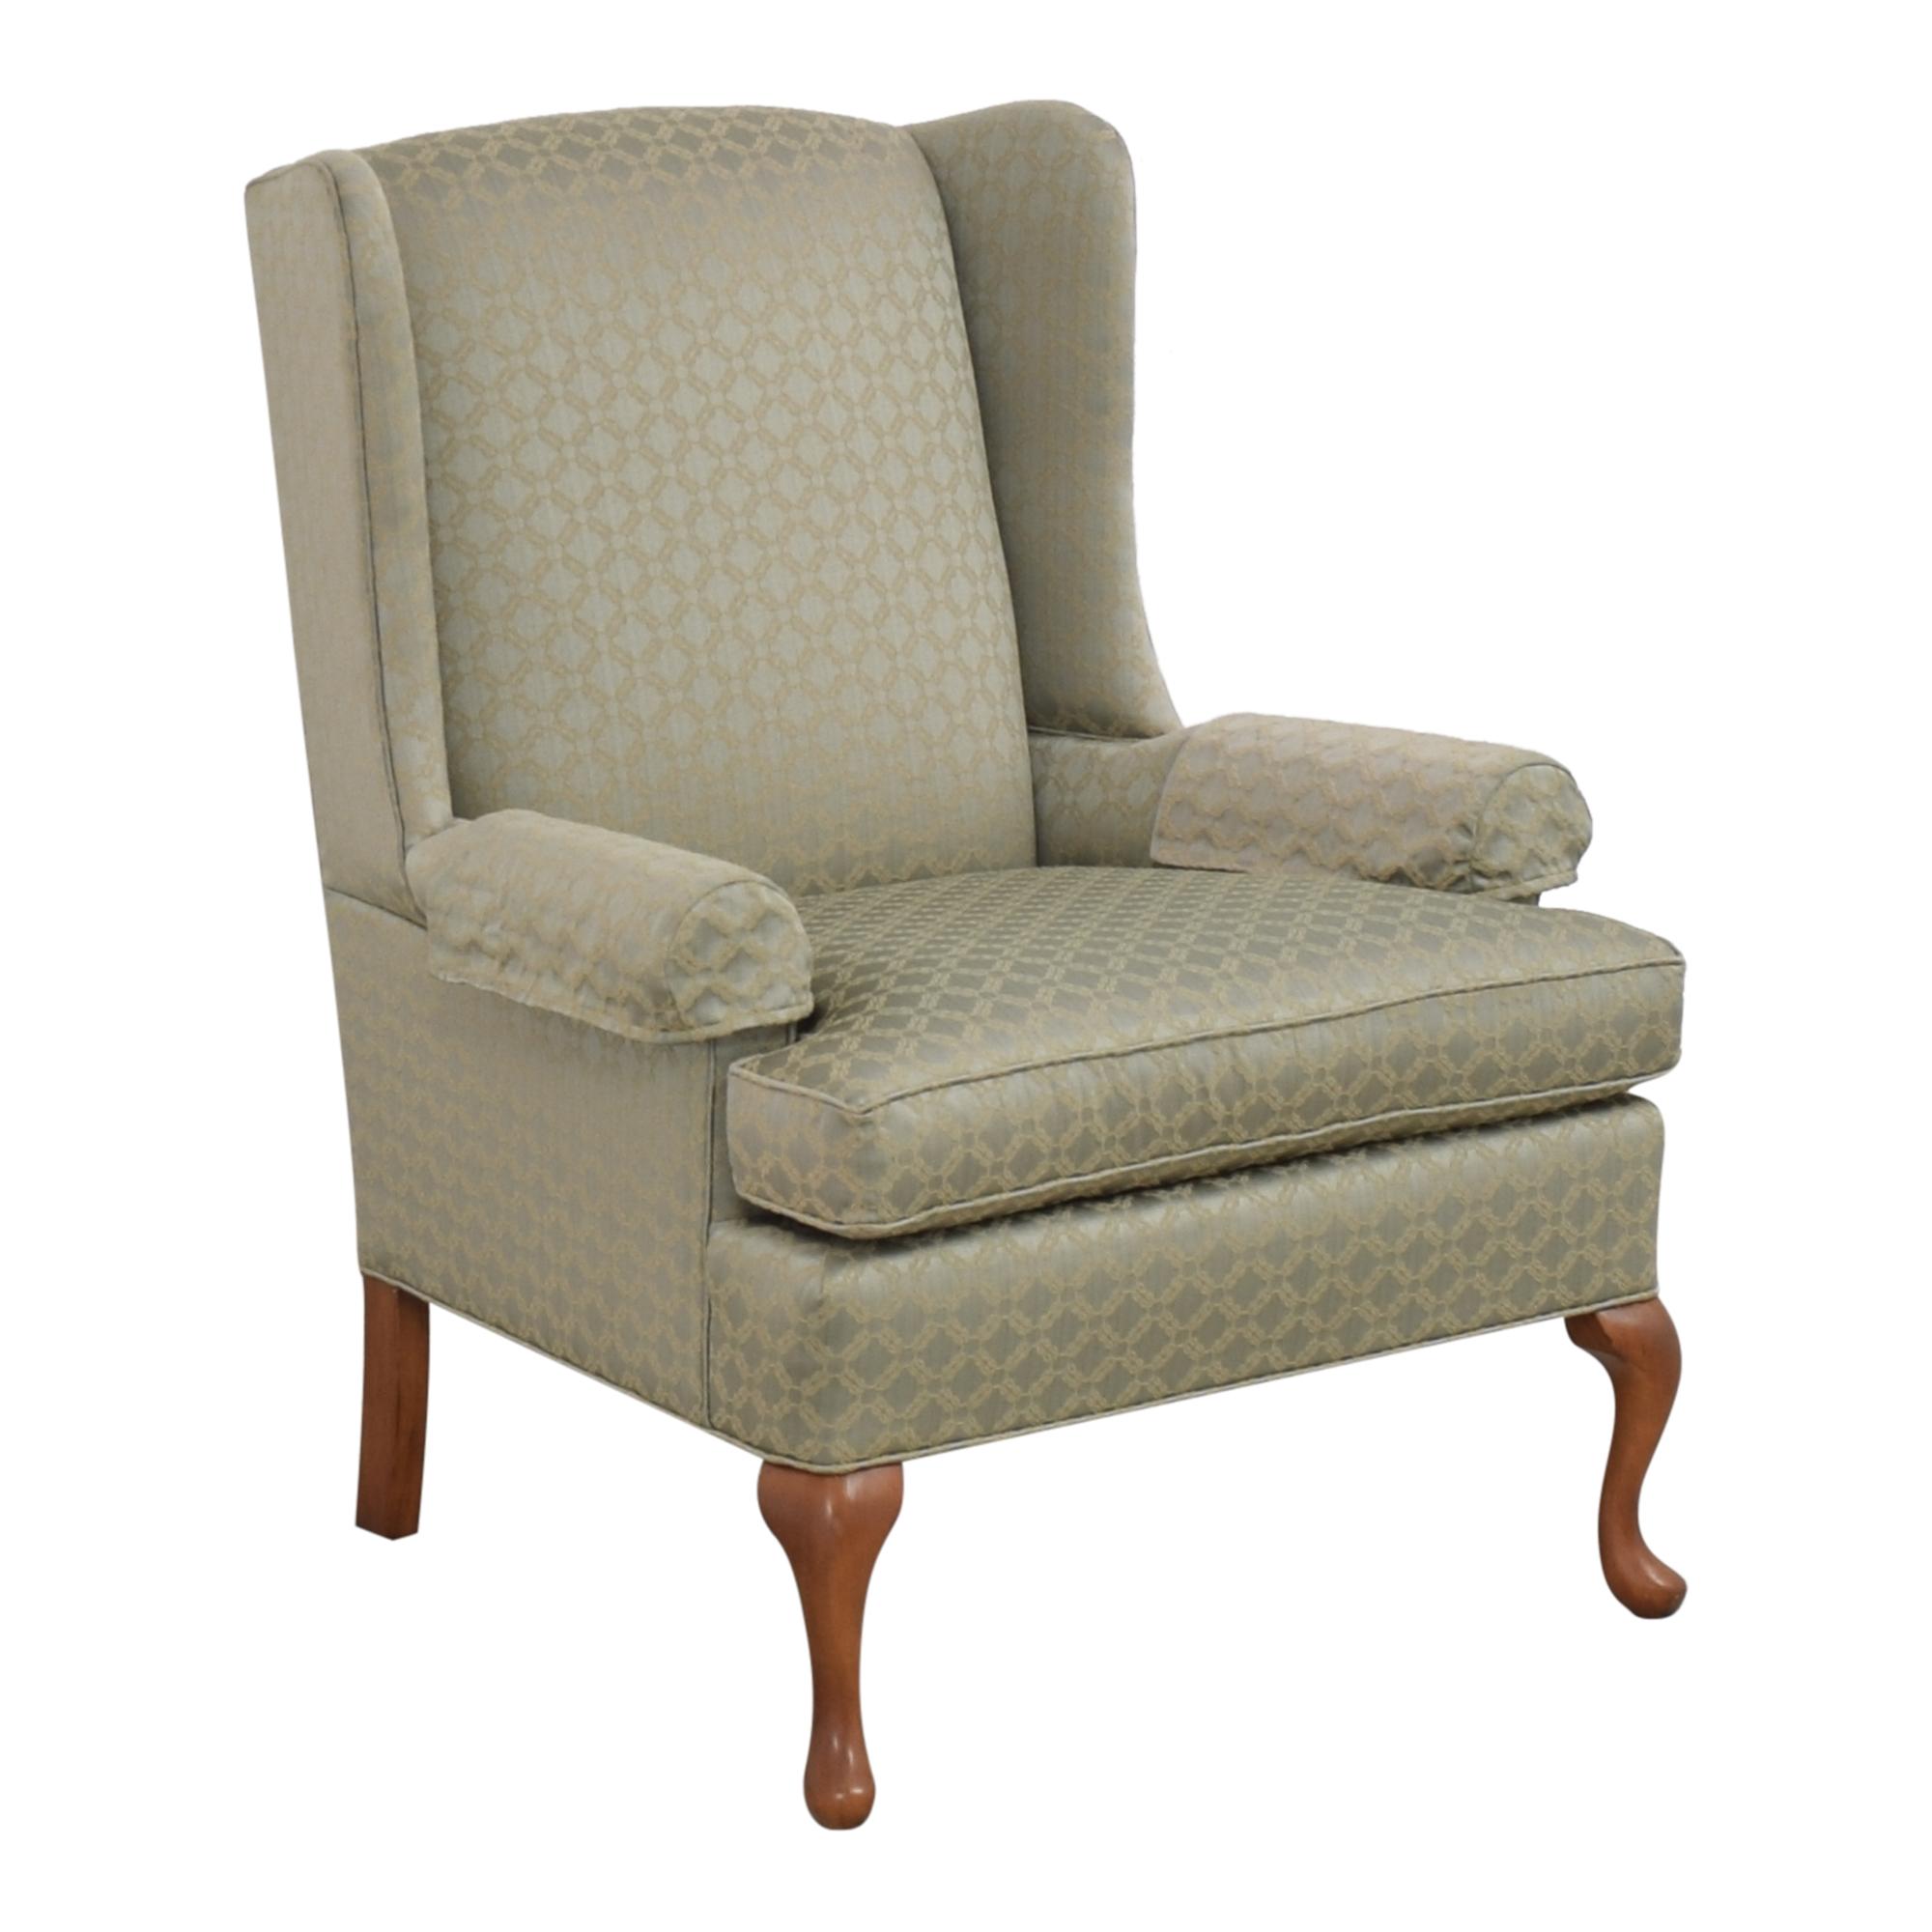 shop Thomasville Wing Chair Thomasville